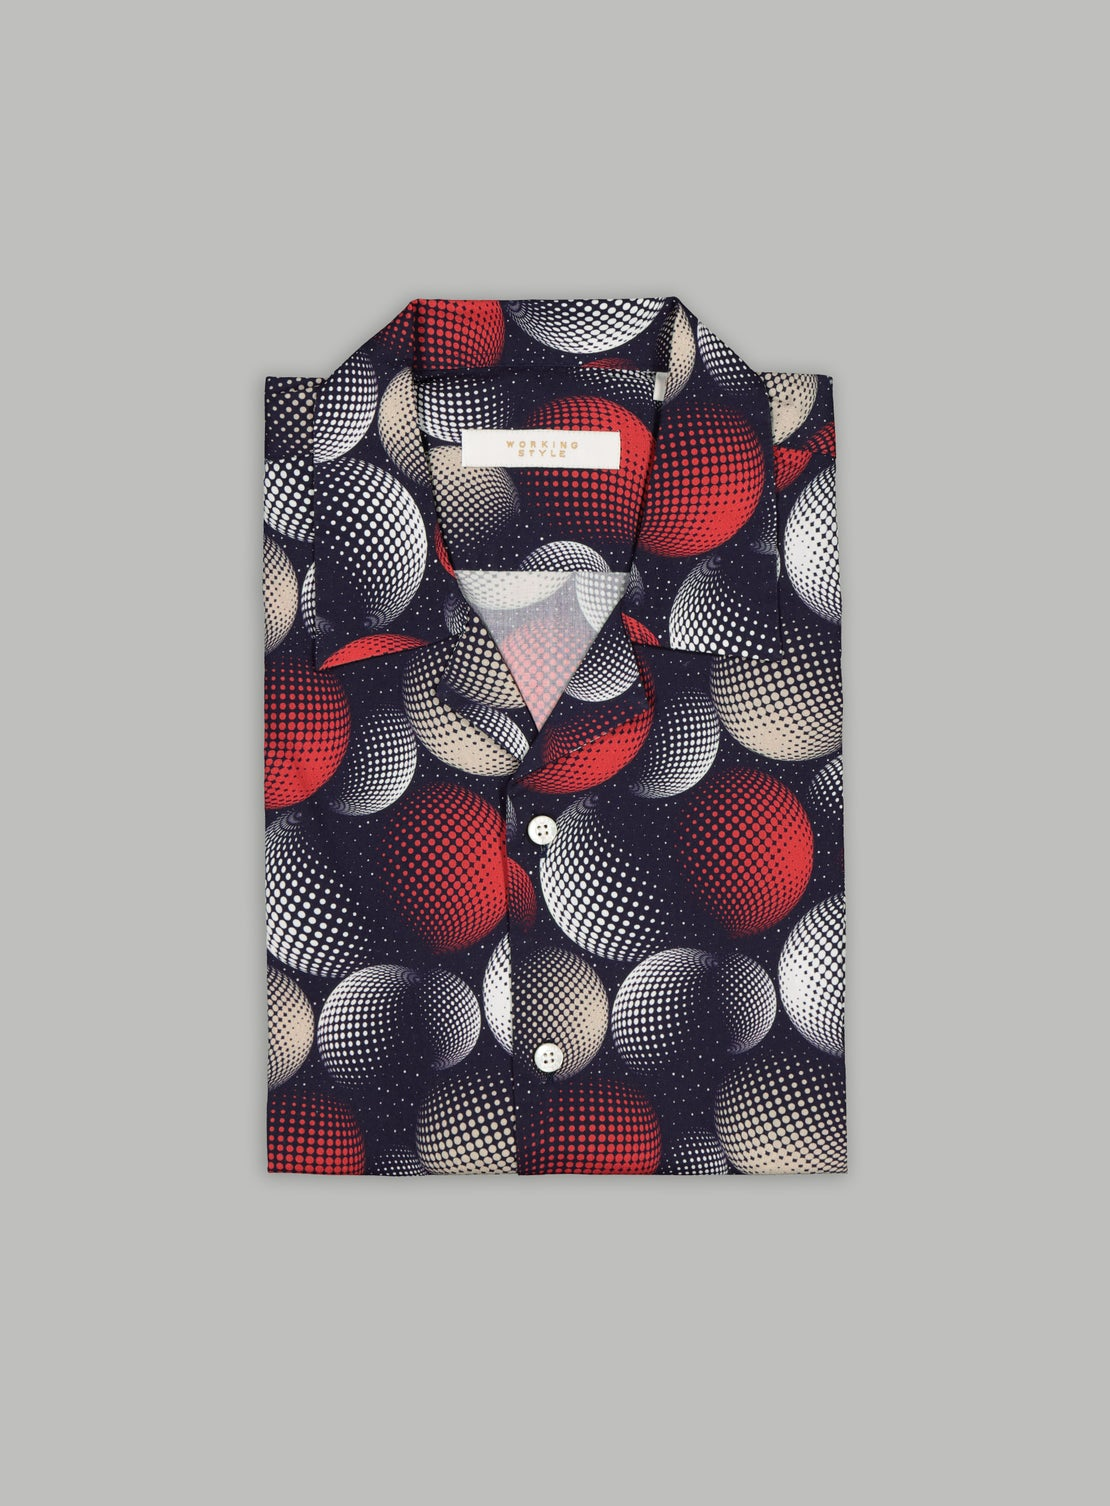 Studio 54 Poplin Short Sleeve Shirt